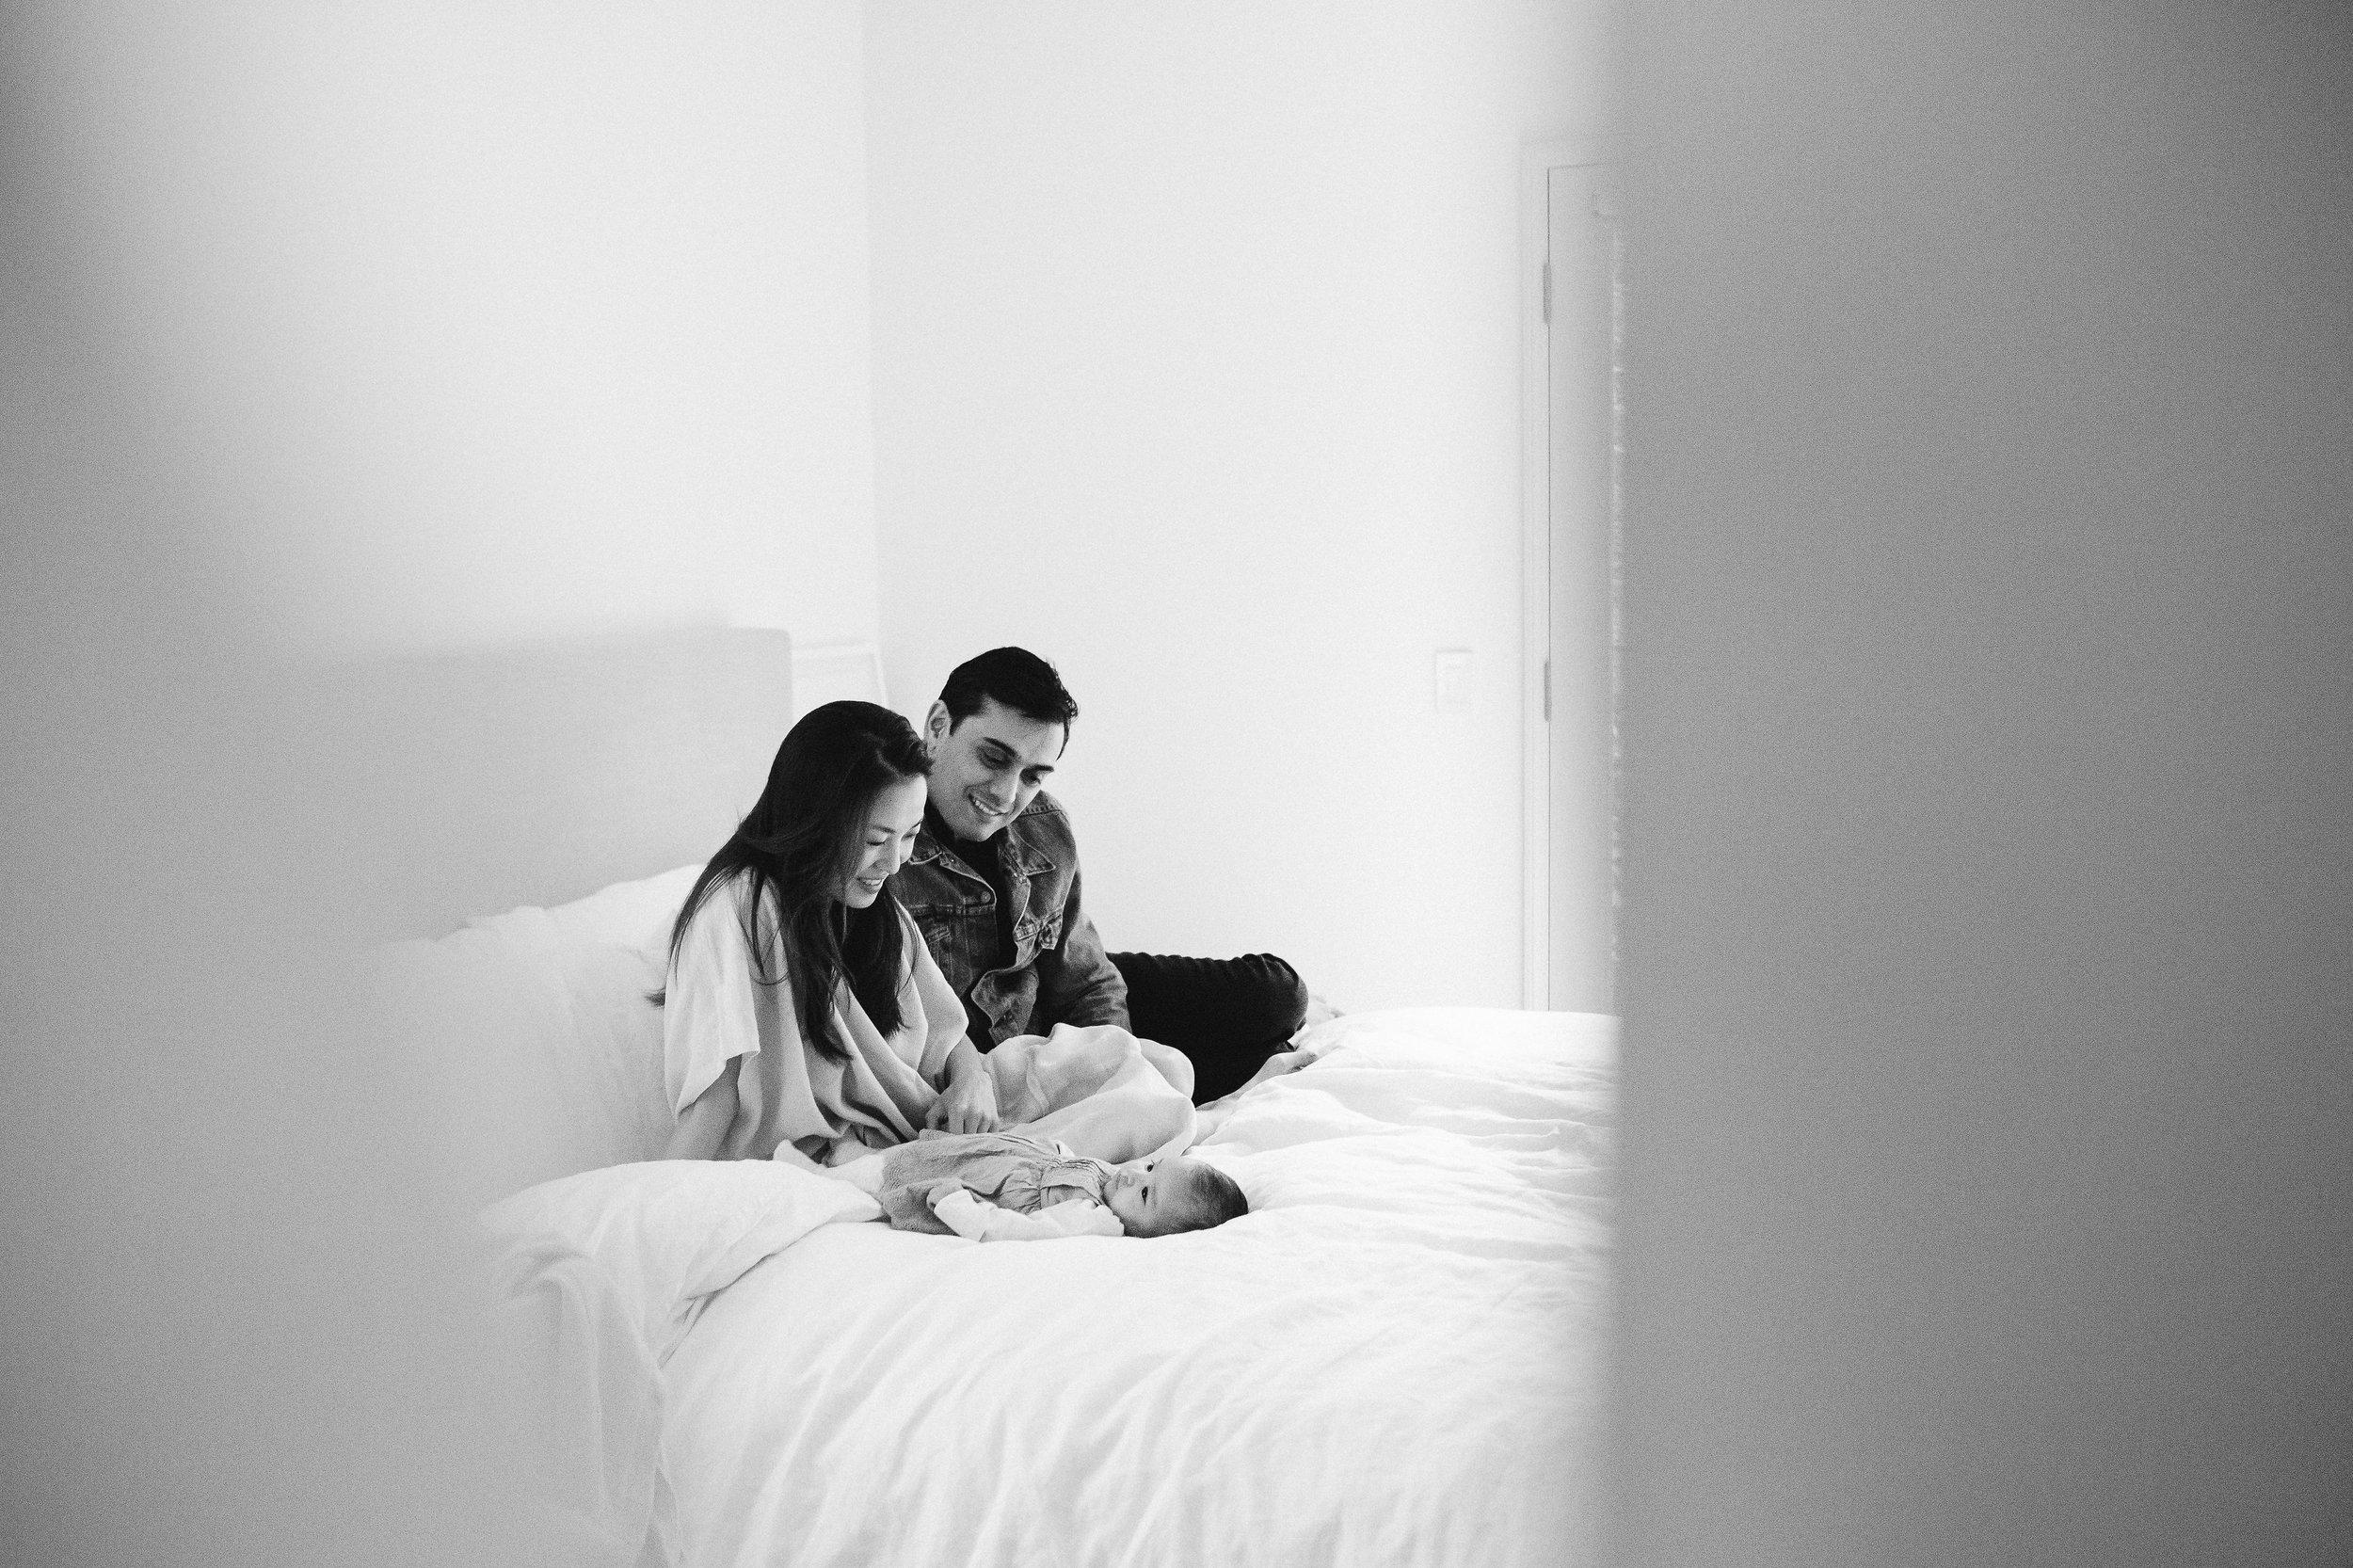 mehana-family-session_la-los-angeles-family-photographer-40.jpg